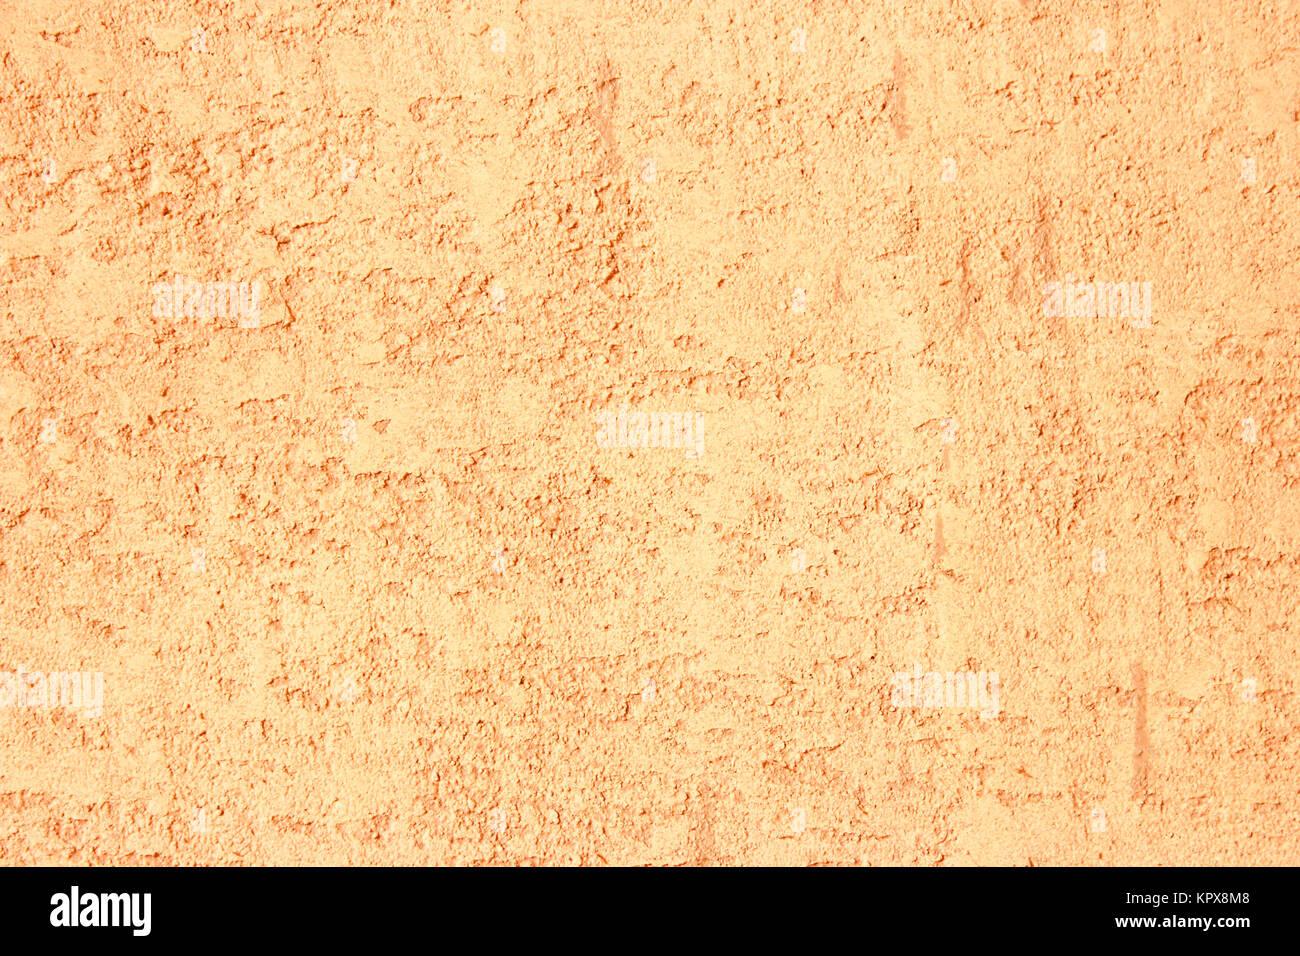 Decorative stucco texture Stock Photo: 168993336 - Alamy